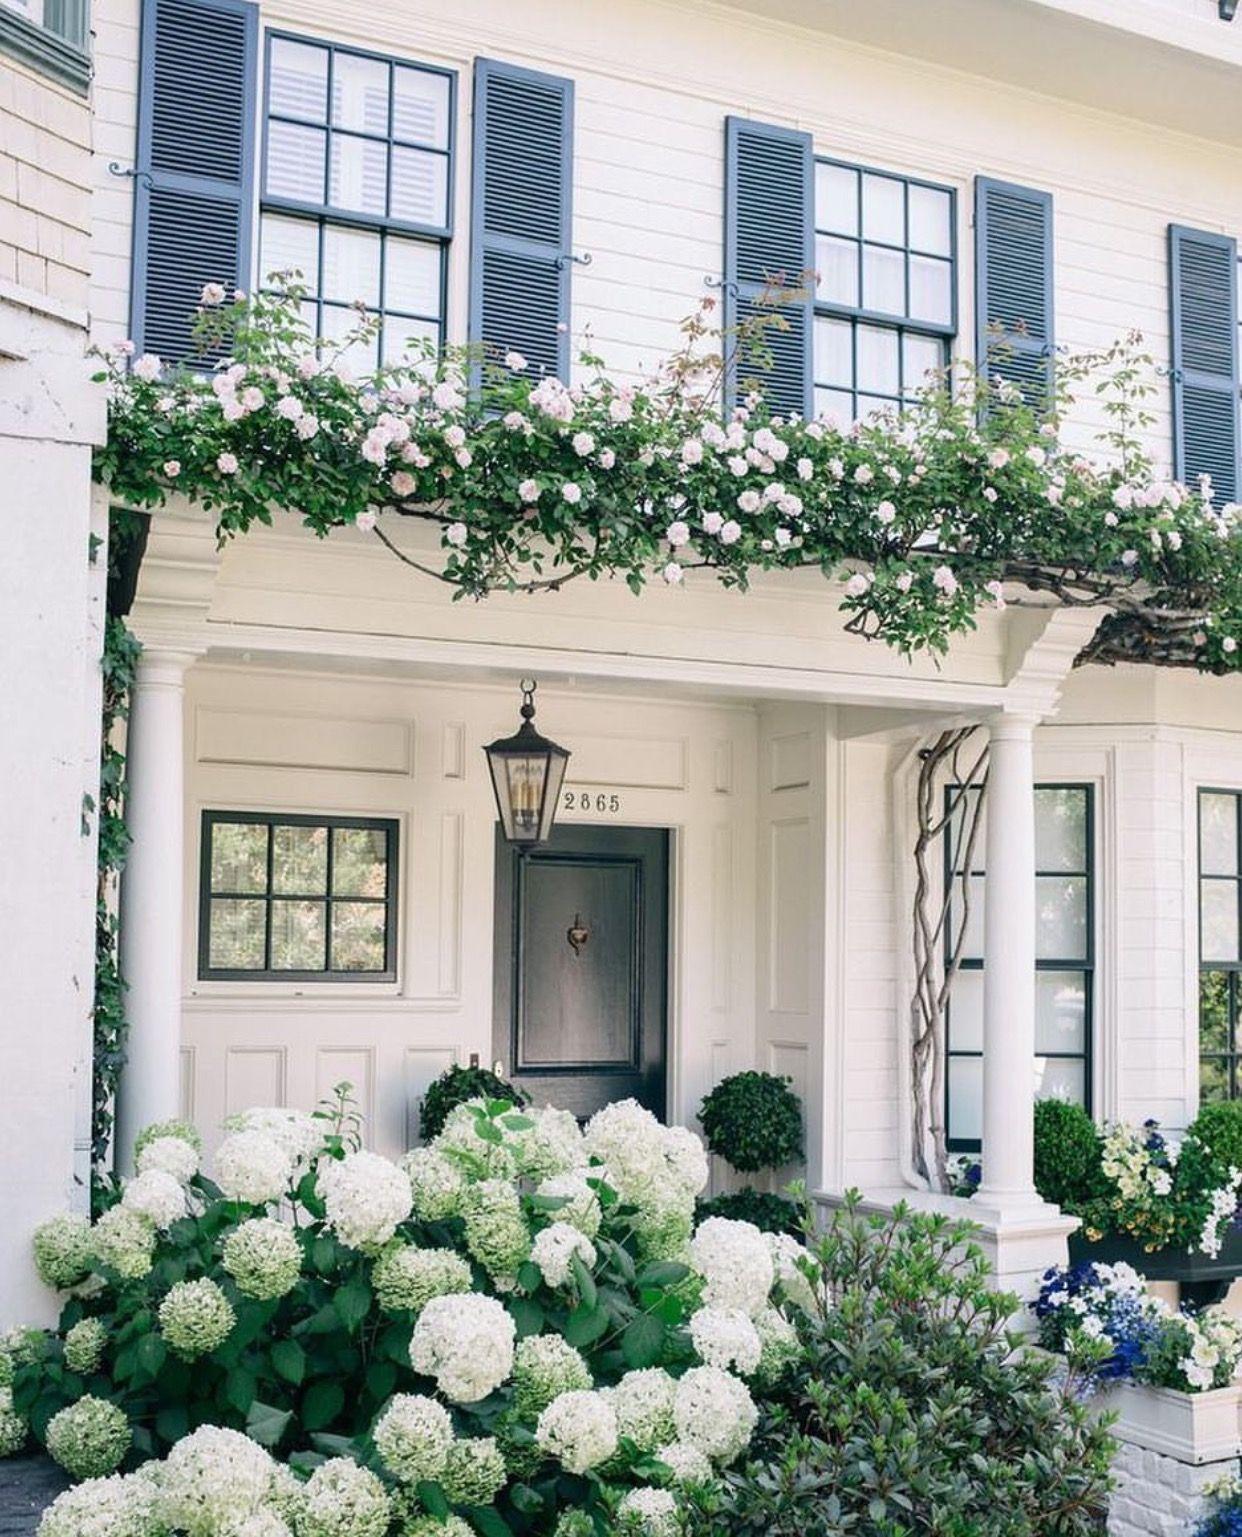 Window well decoration ideas  love the trellis and white house  decor ideas  pinterest  white